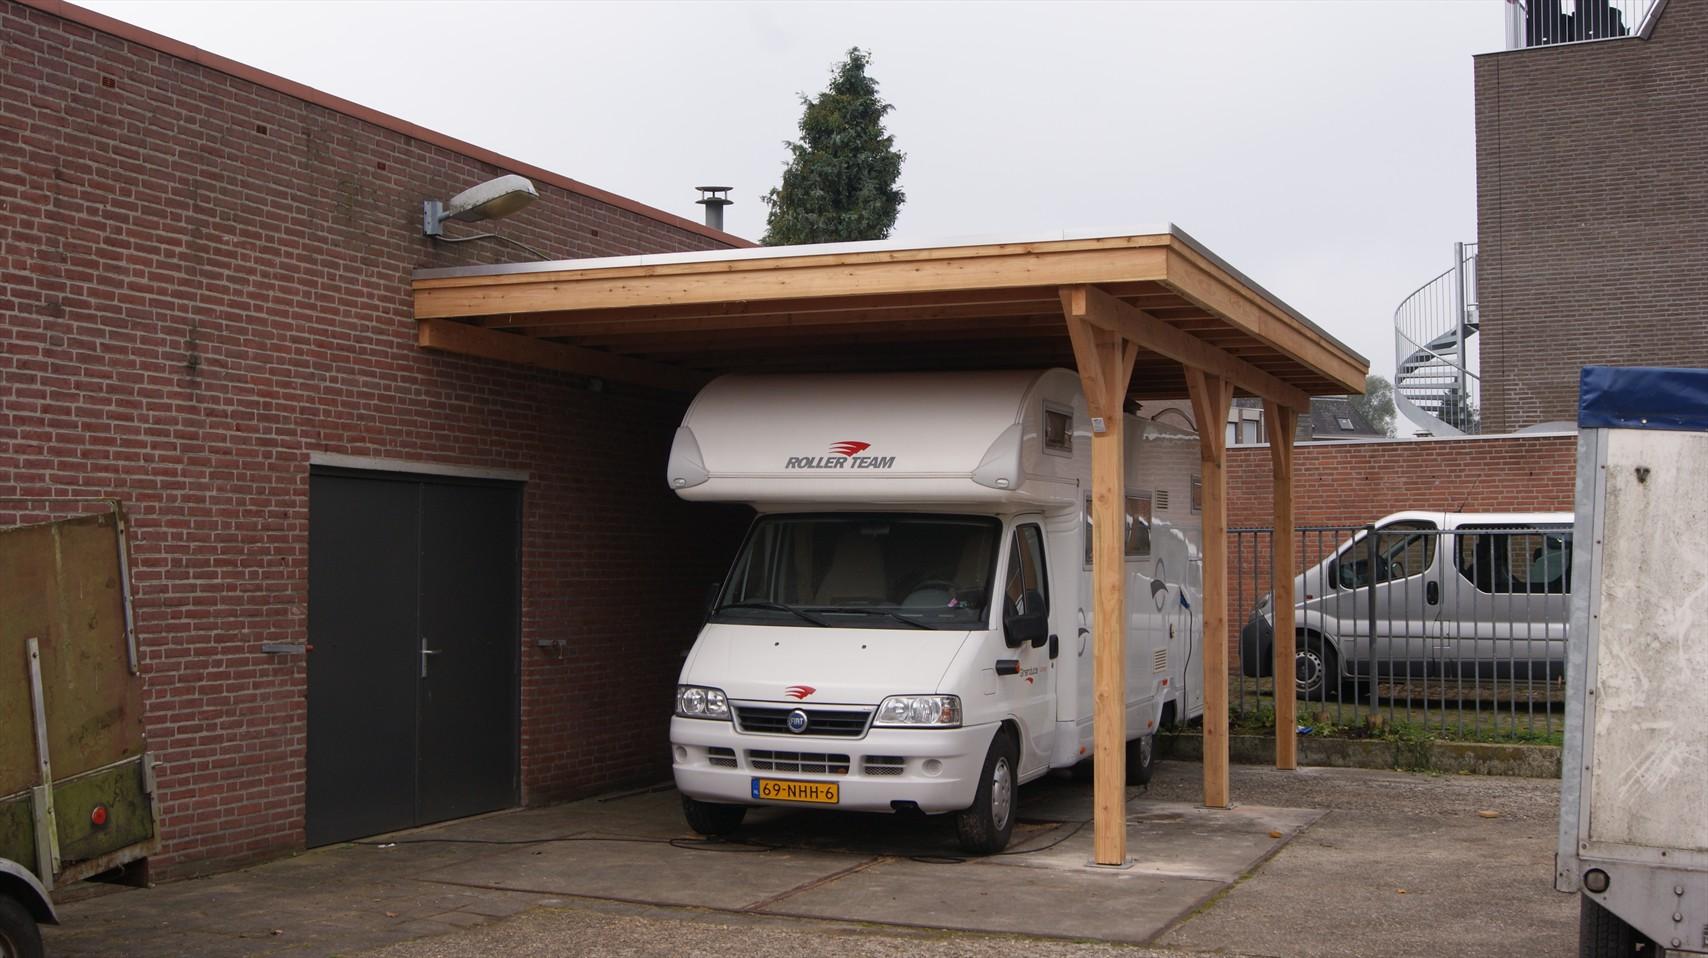 douglas carport plat dak tegen gevel 4 x 25m